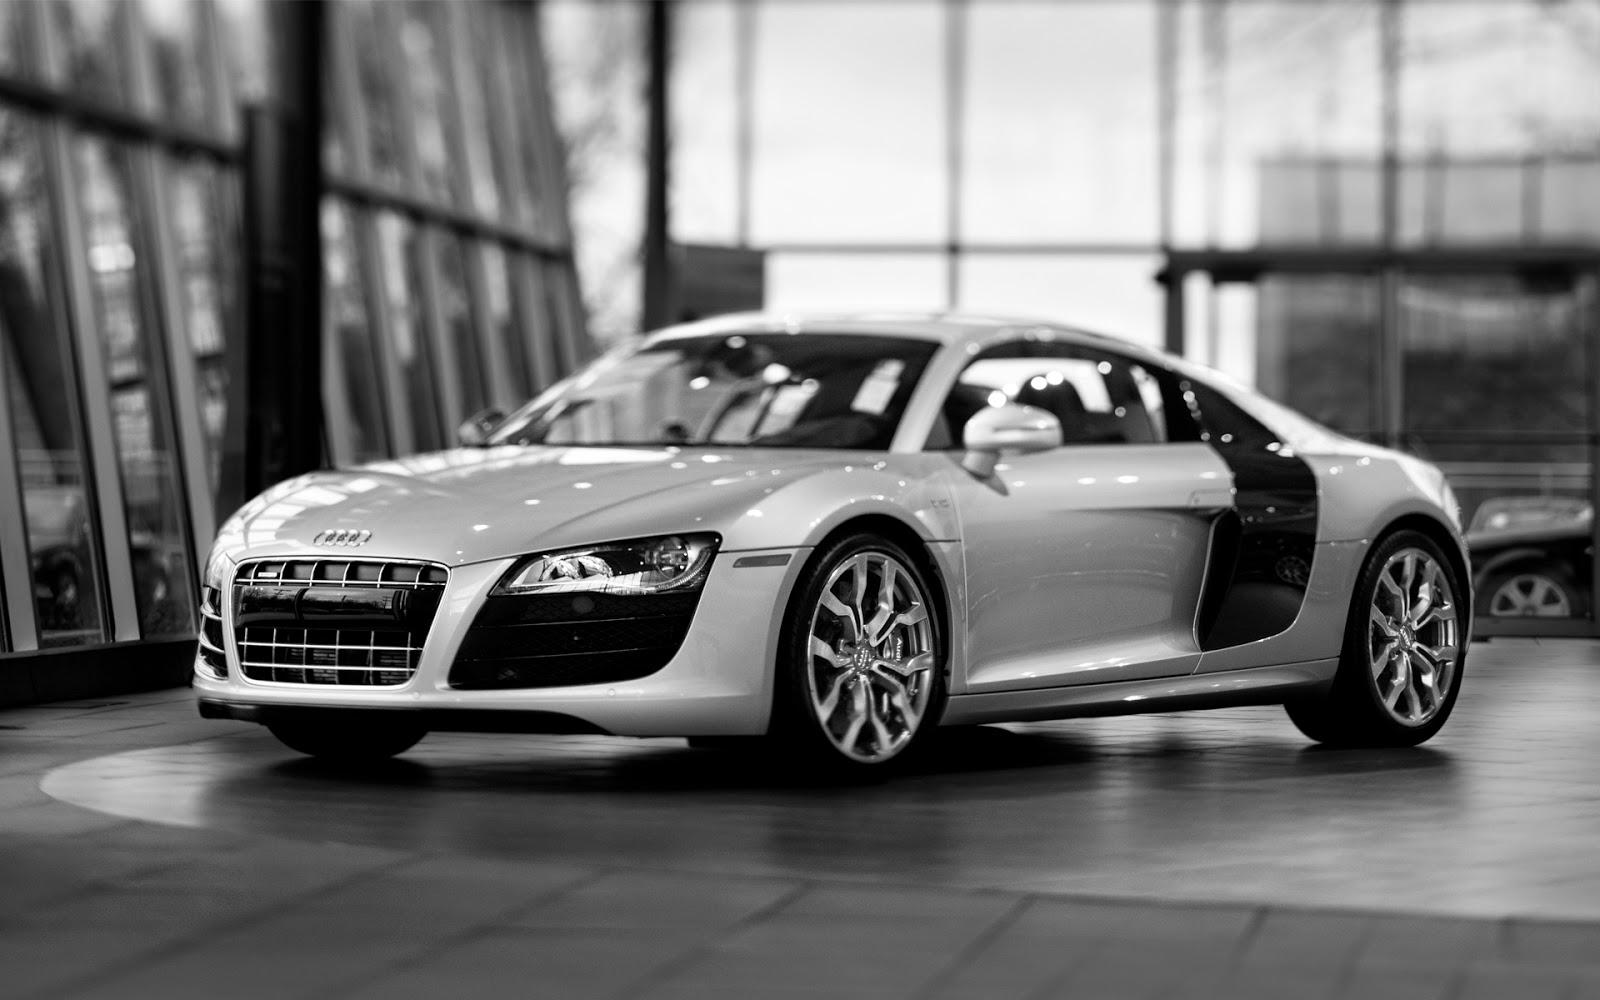 http://www.autocarsinfo.com/2014/10/audi-r8-v10-fsi-coupe-best-wallpaper.html